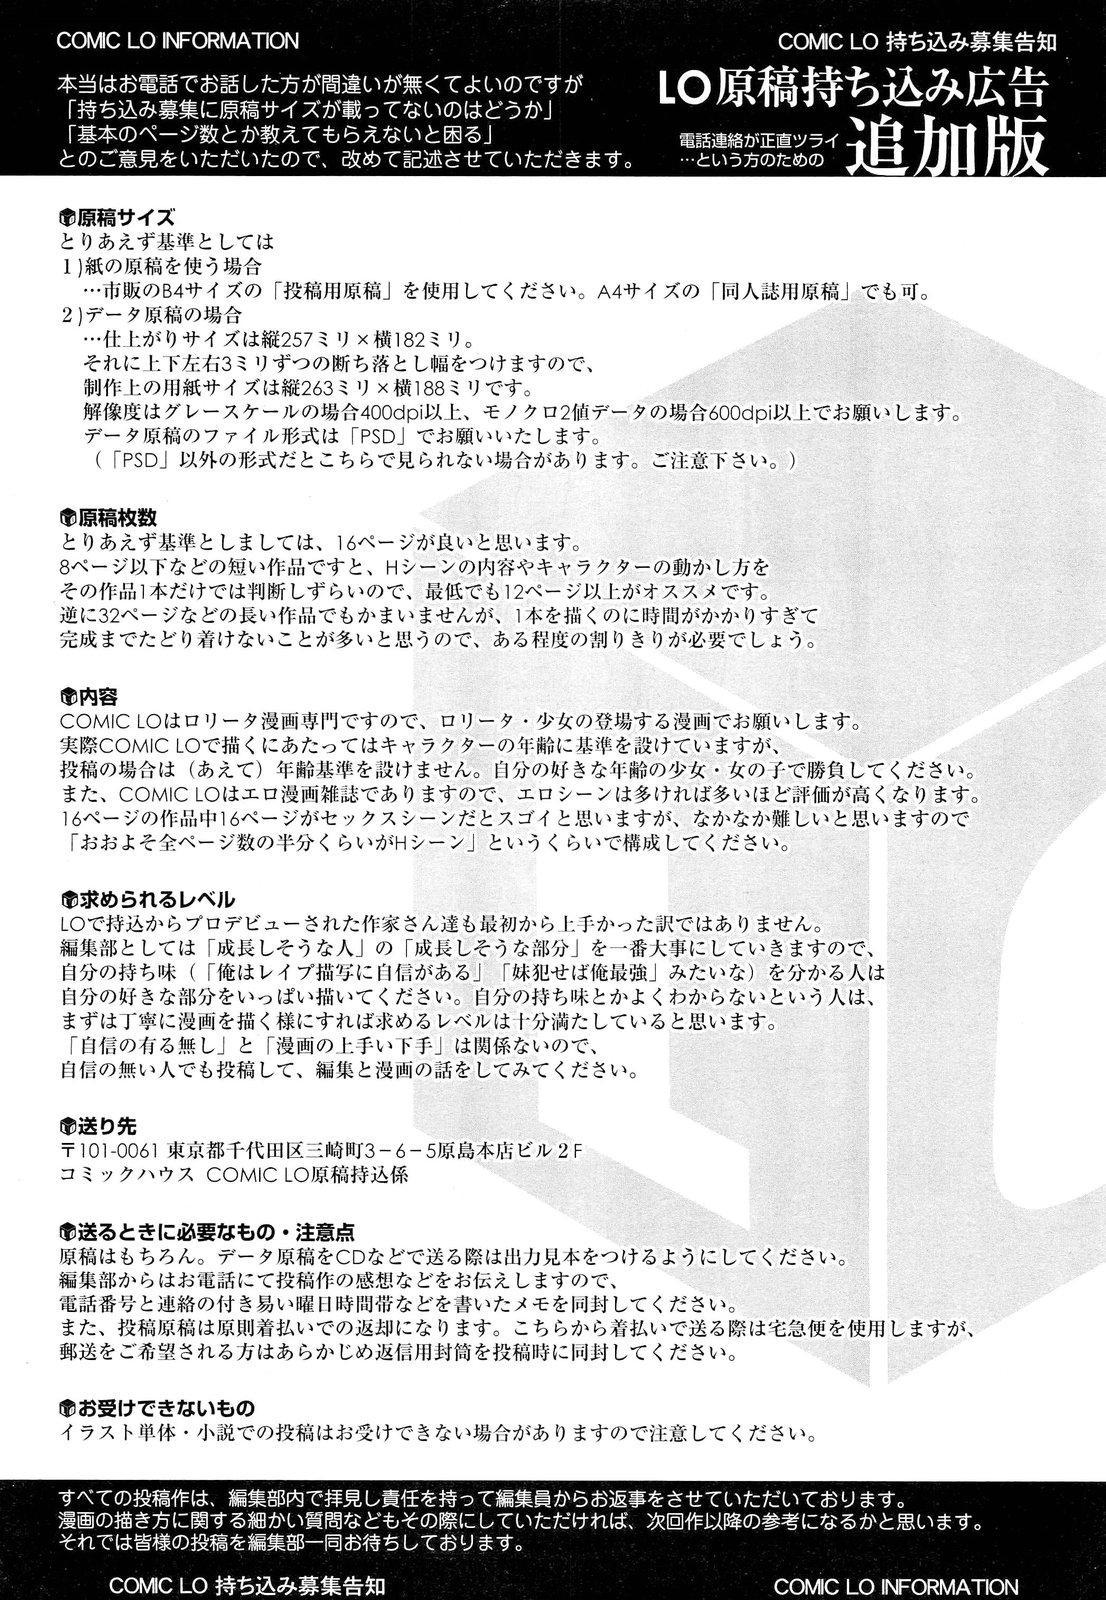 COMIC LO 2012-05 Vol. 98 440